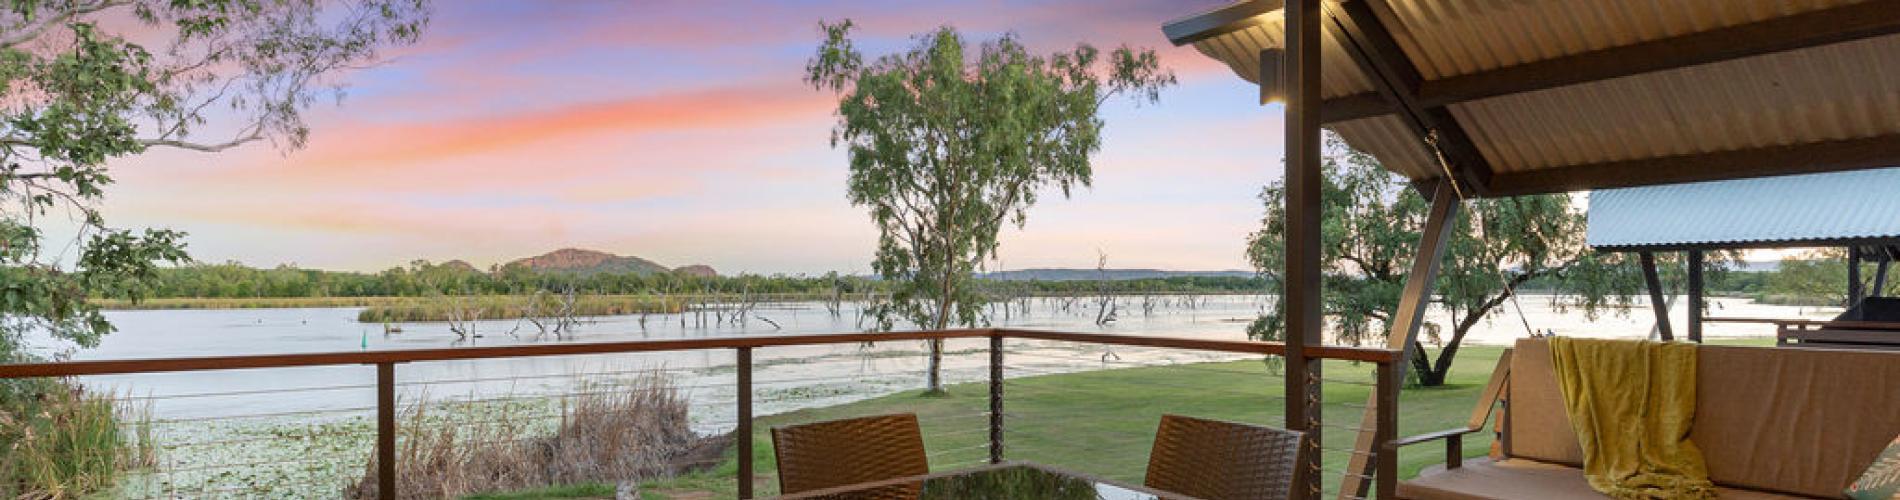 Waterfront Villa Accommodation at Kimberleyland in Kununurra